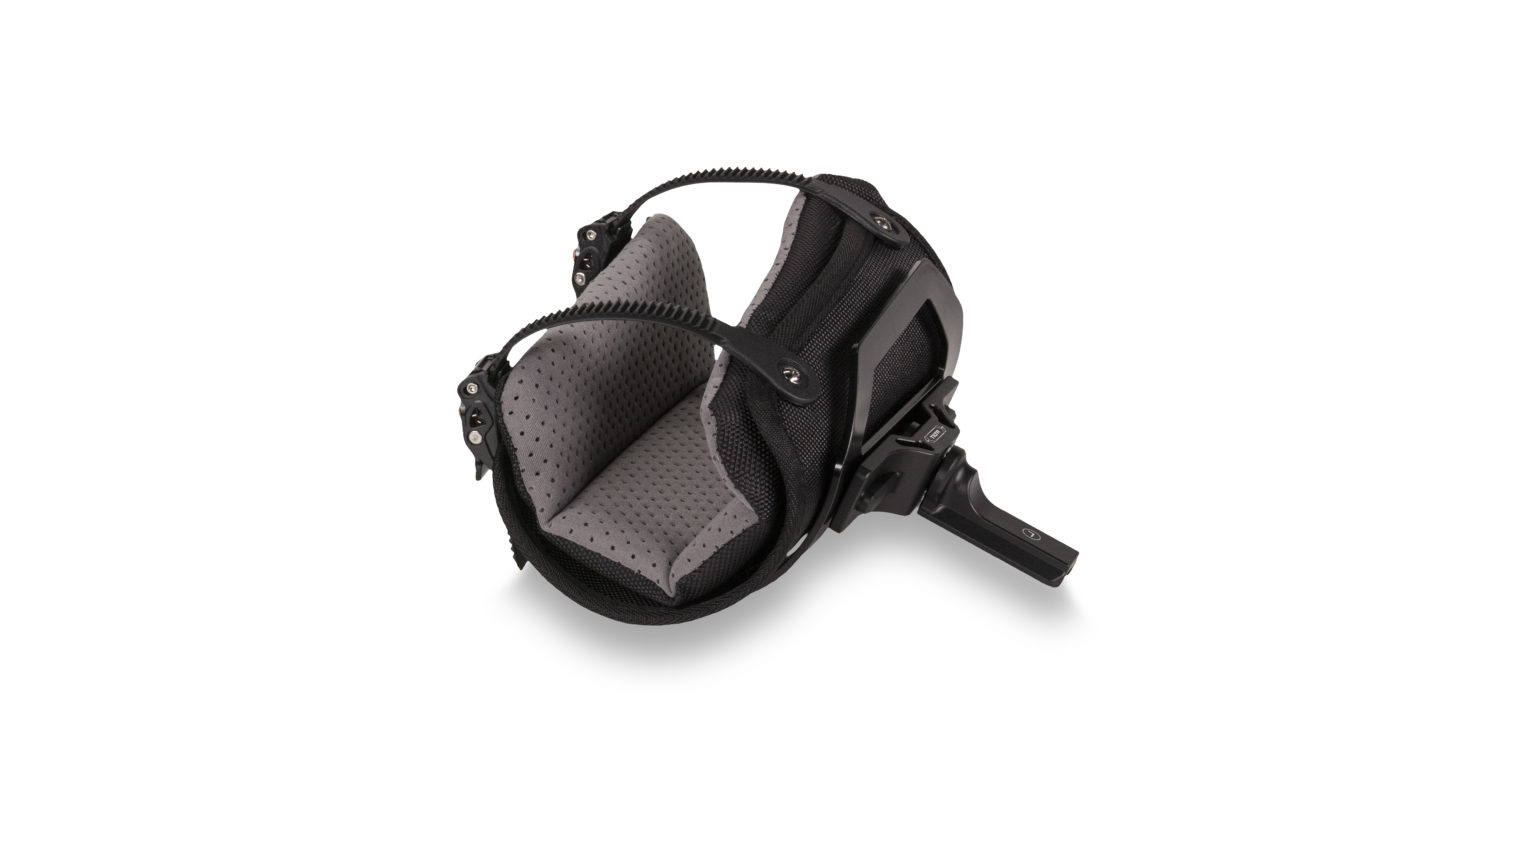 Armorman 3.0 Velcro Wrist Attachment Plate - Left